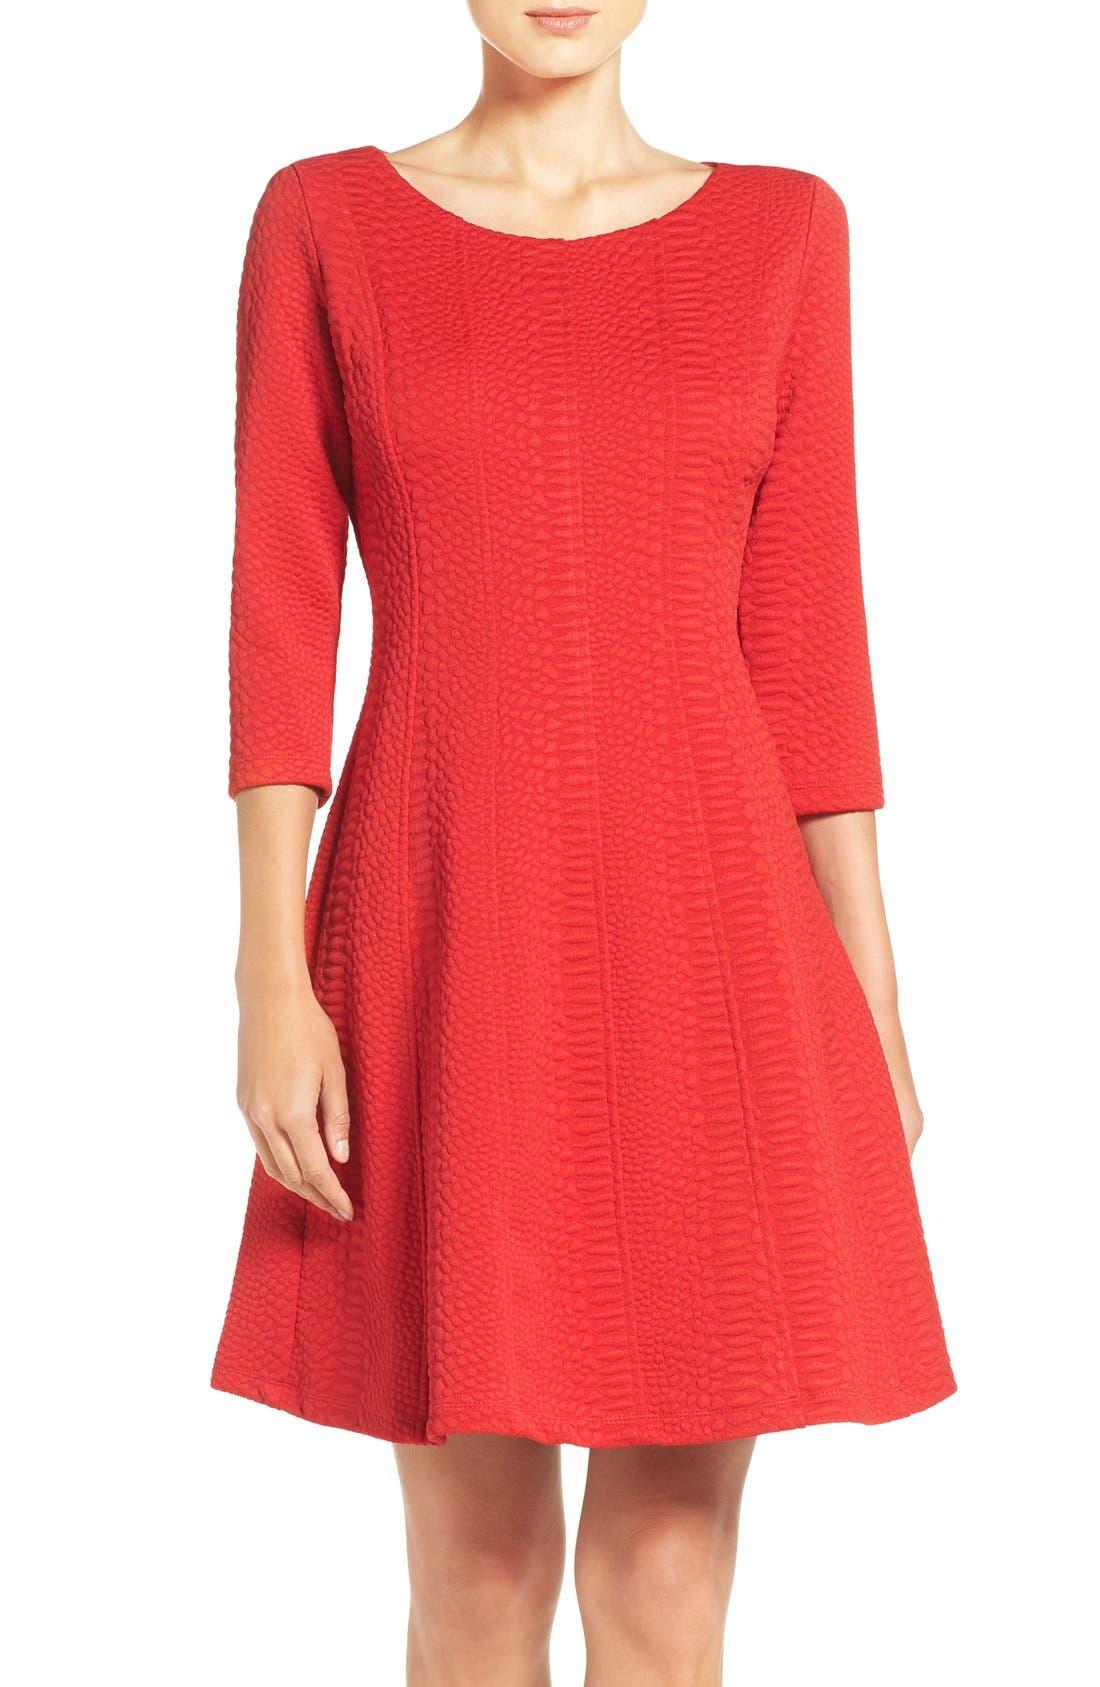 Taylor Dresses Jacquard Knit Fit & Flare Dress